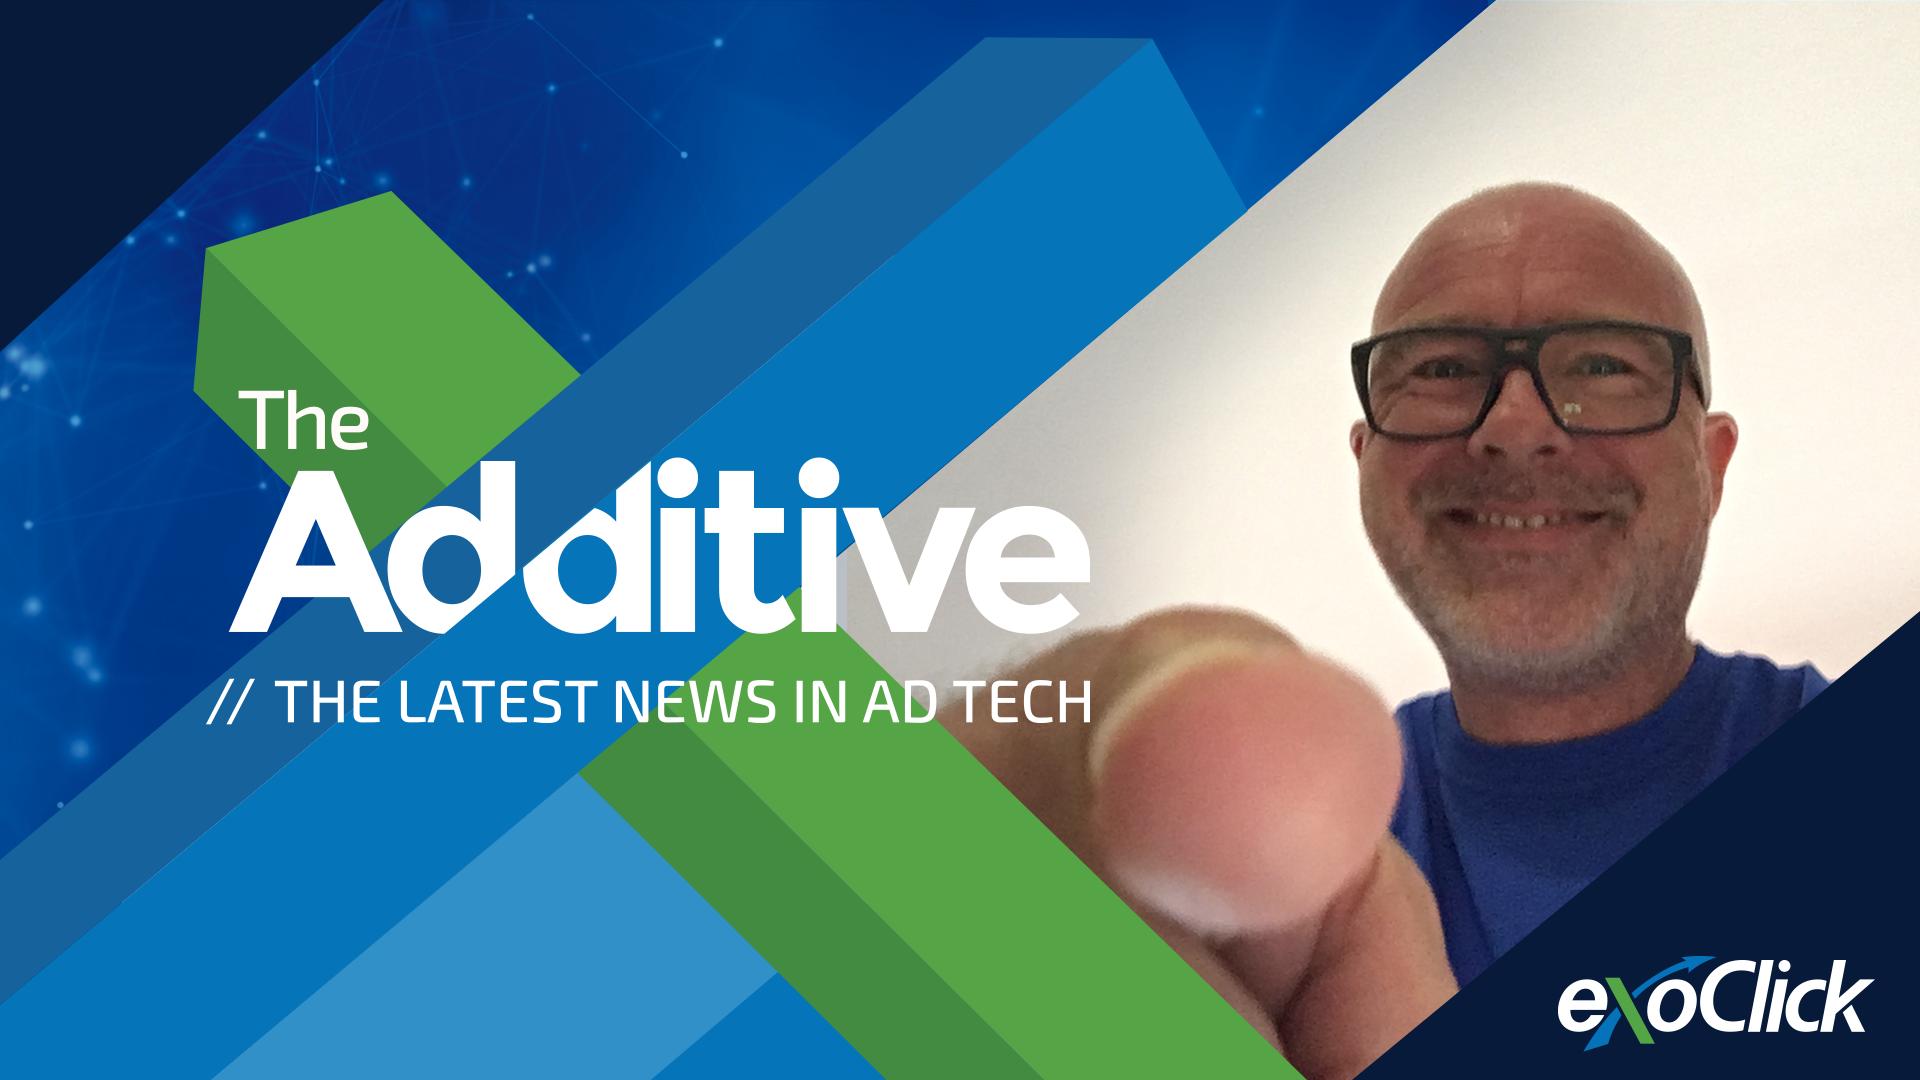 The Additive September/October 2020